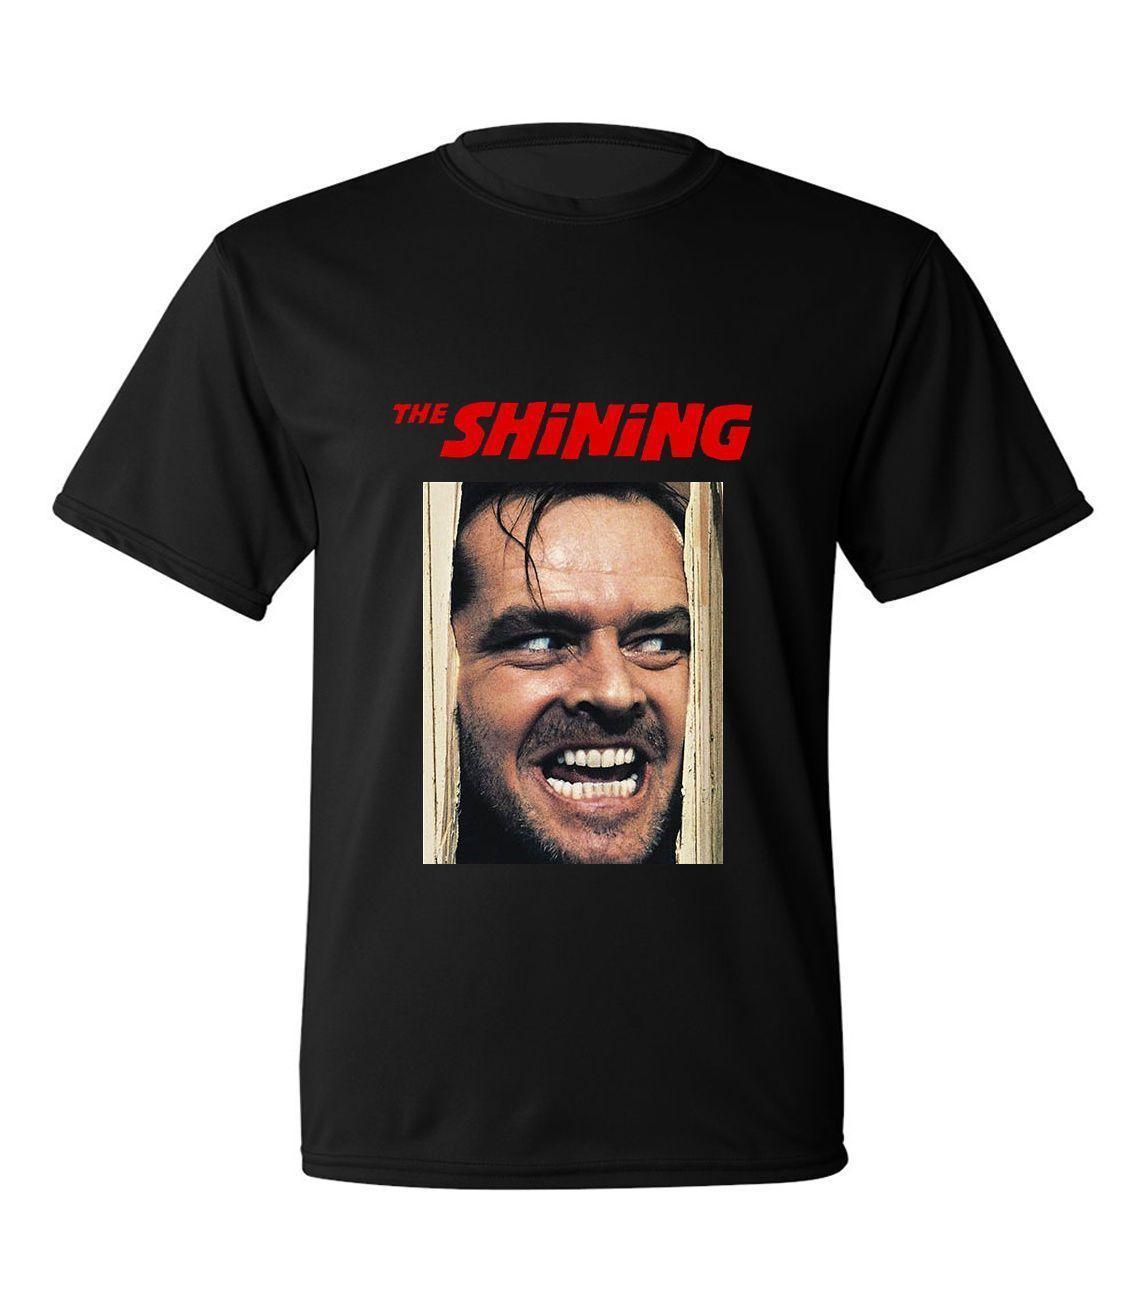 THE SHINING Movie Poster Jack Nicholson T Shirt Crazy